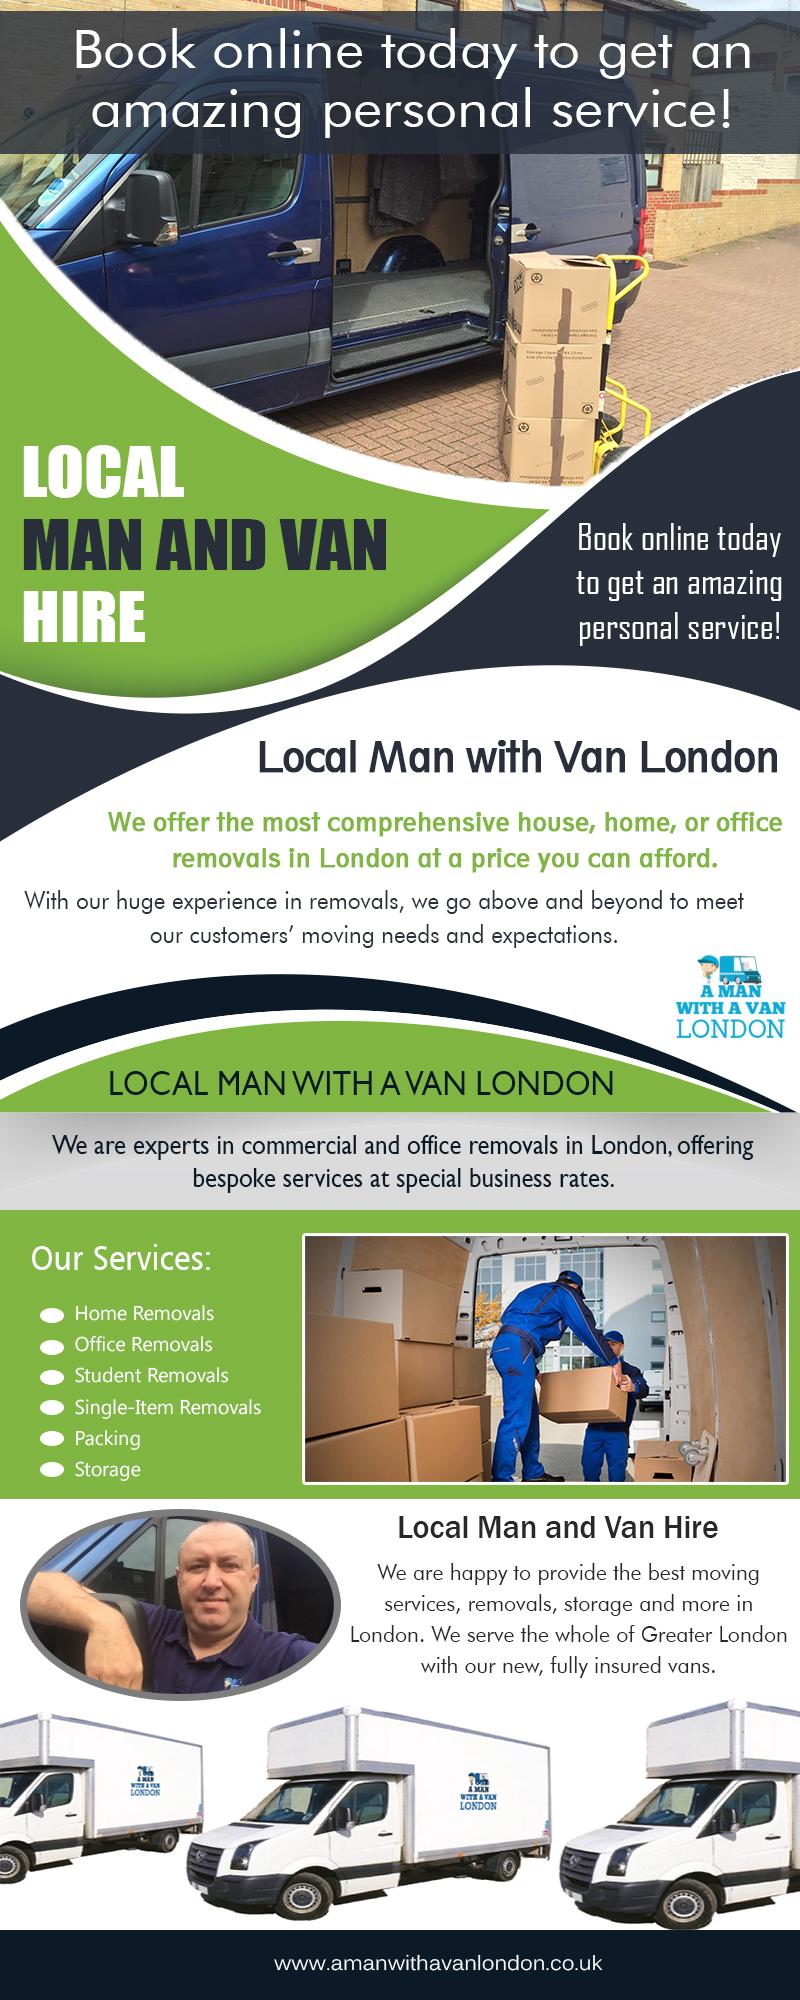 Local Man and Van Hire|https://www.amanwithavanlondon.co.uk/